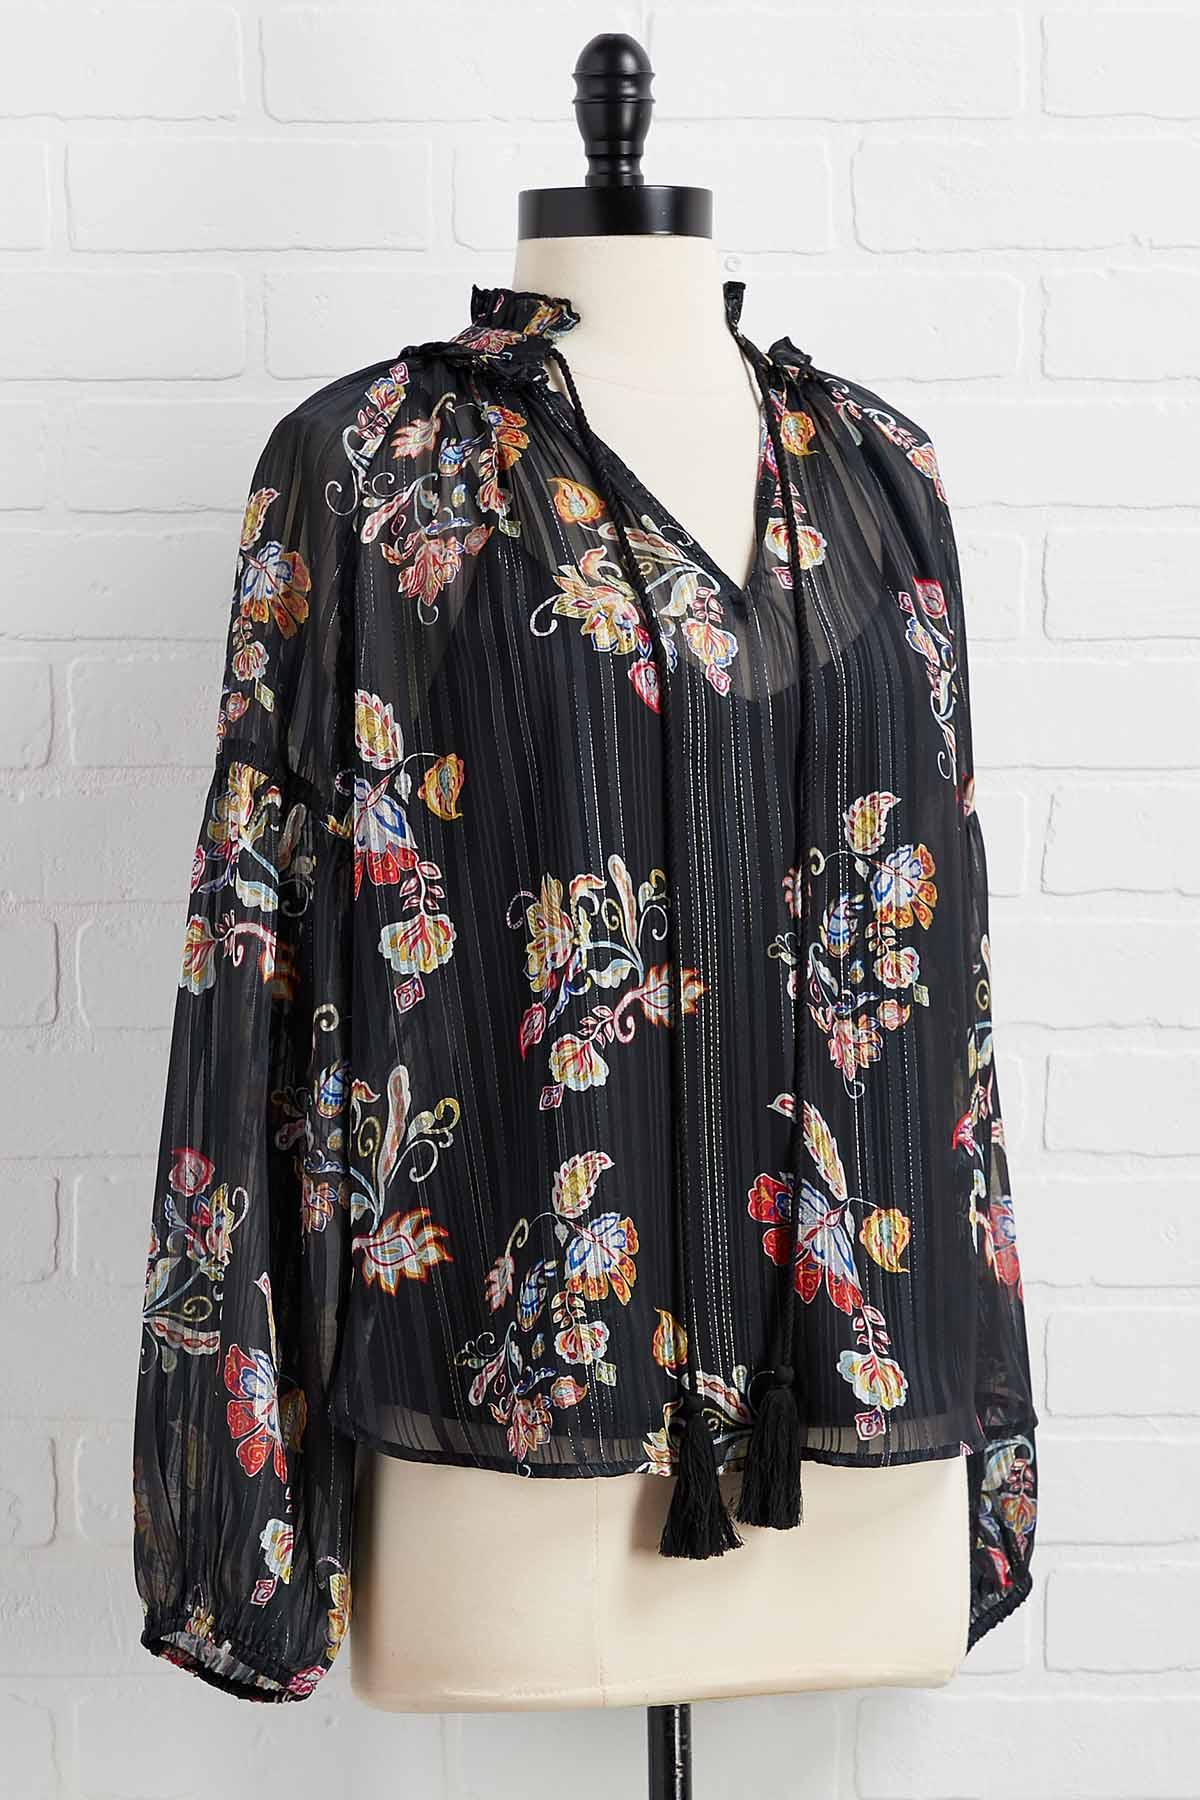 Sew Boho Floral Top